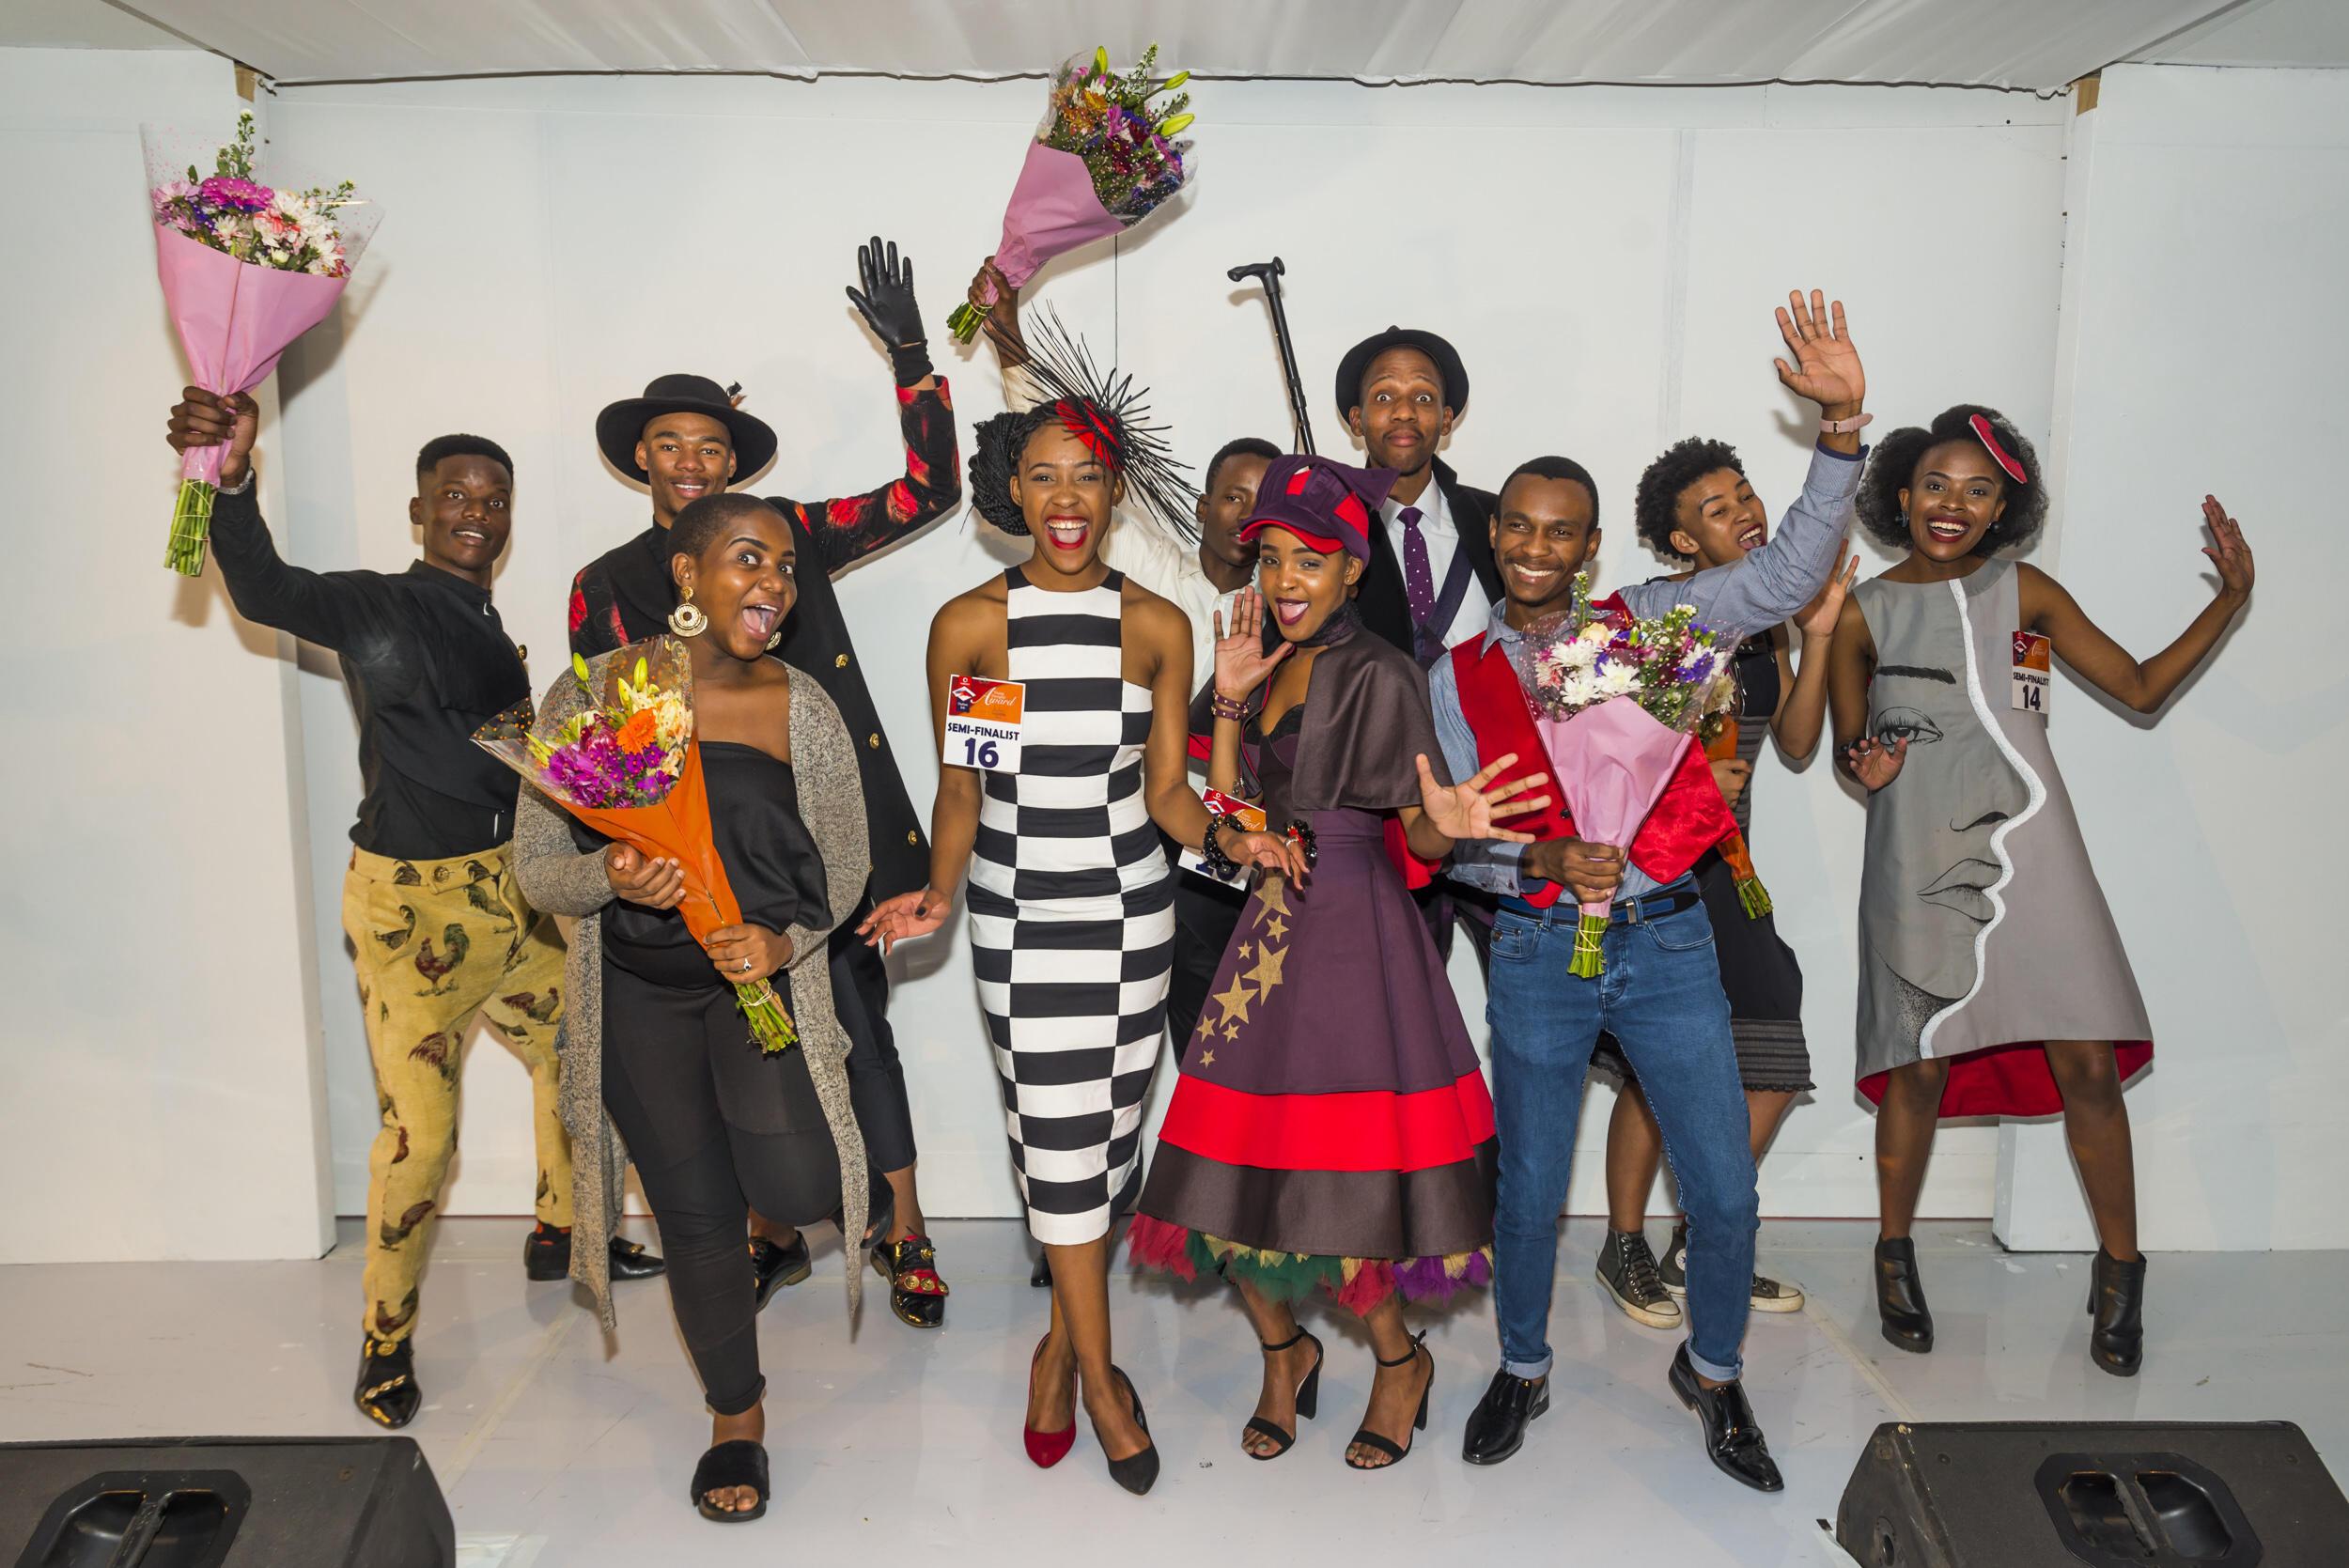 Top 10 Young Designers Chosen For Vdj Award Rising Sun Overport